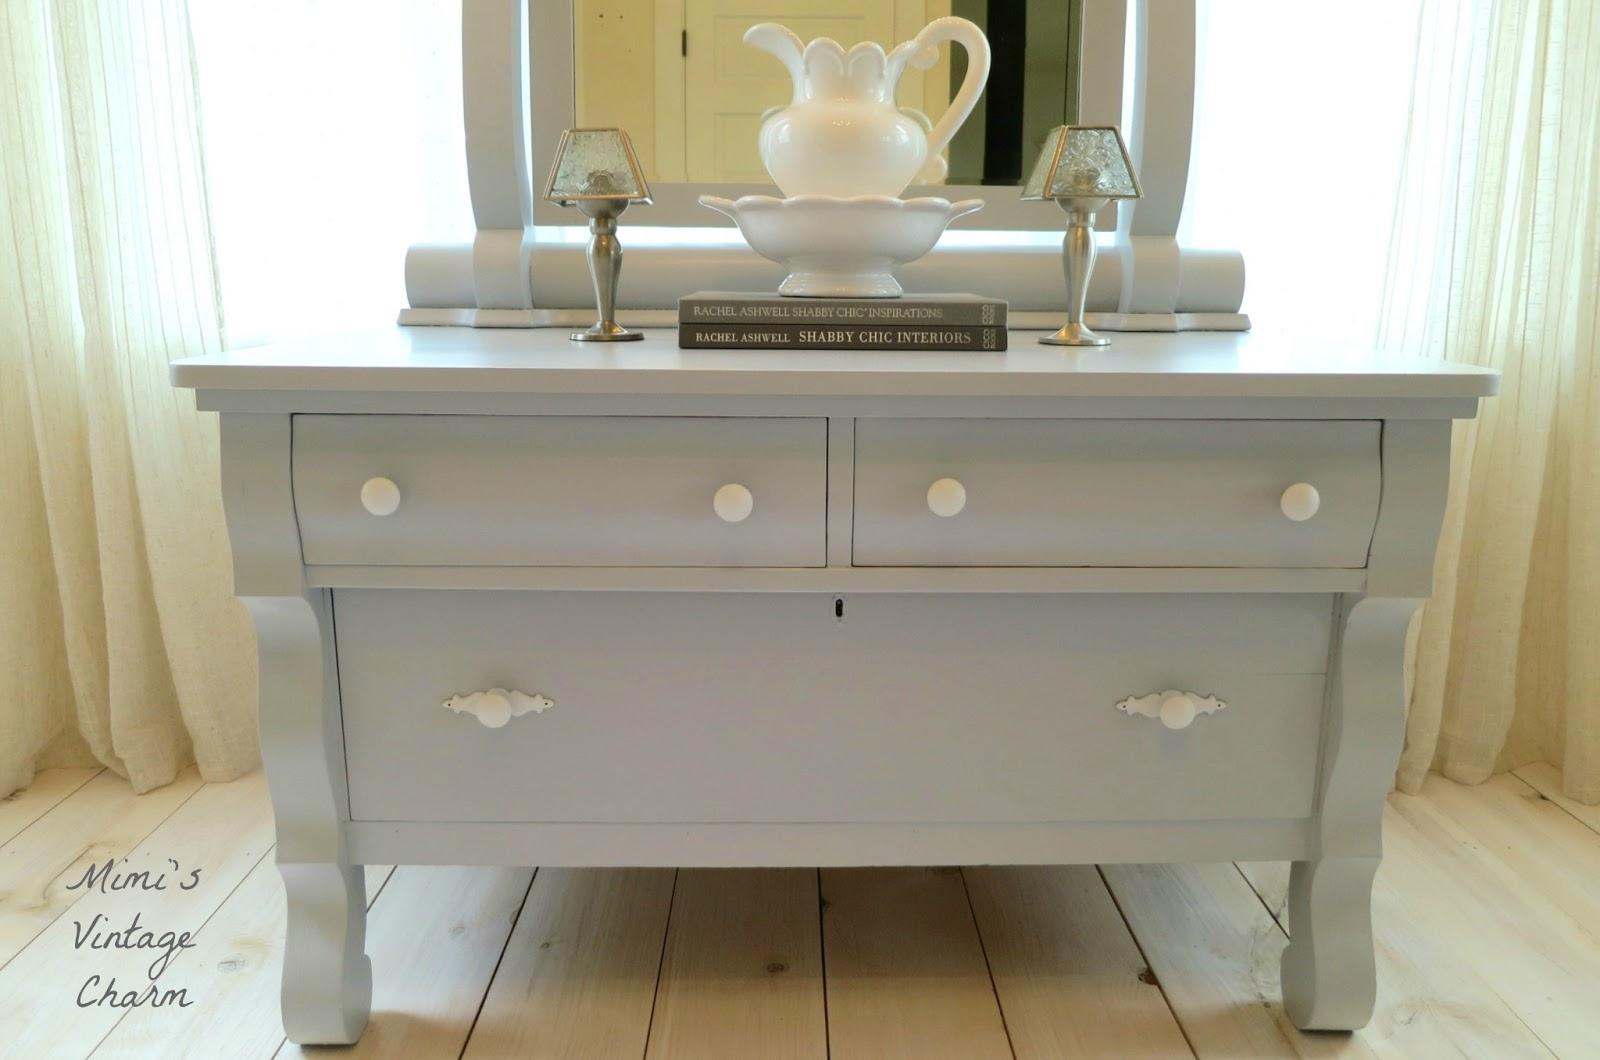 Antique dresser bathroom vanity - Empire Dresser And A Custom Bathroom Vanity